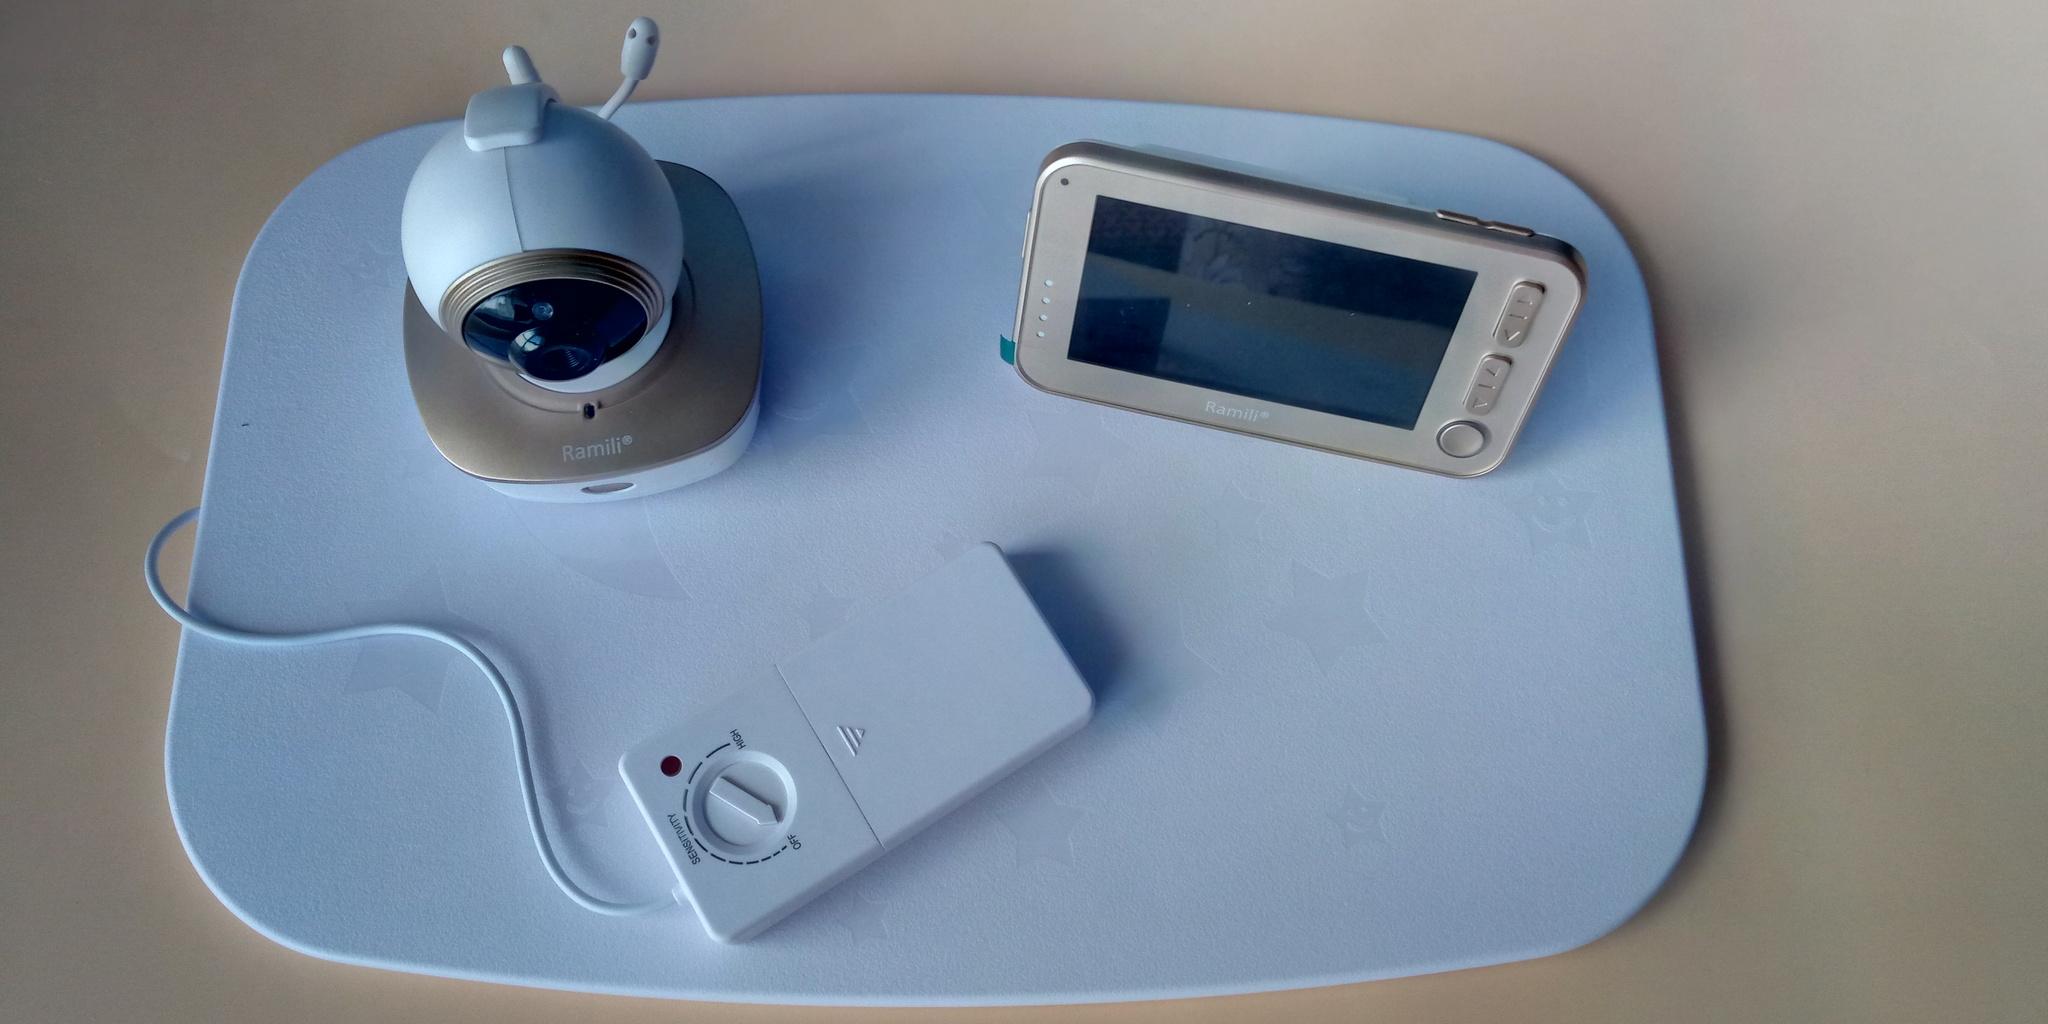 Видеоняня с монитором дыхания Ramili Baby RV1300SP2